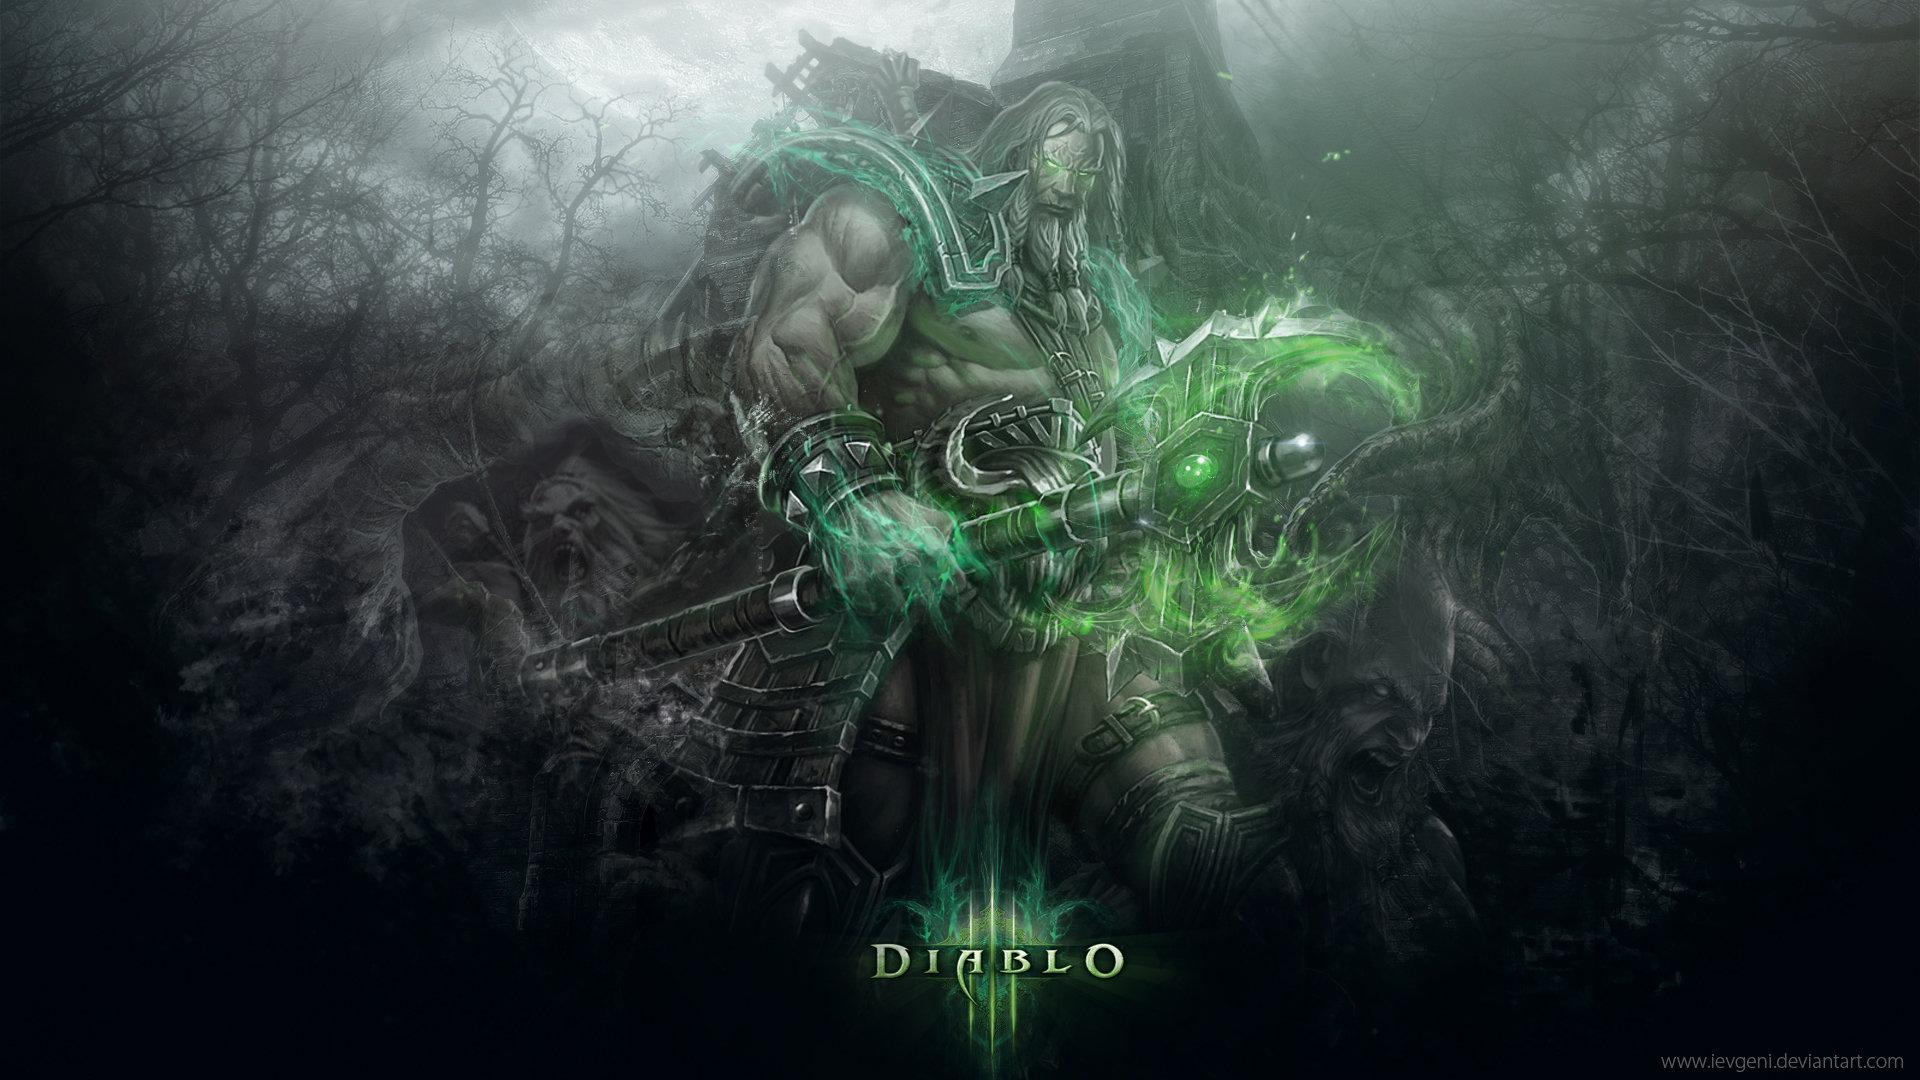 High Resolution Diablo Hd 1920x1080 Wallpaper Id351824 For